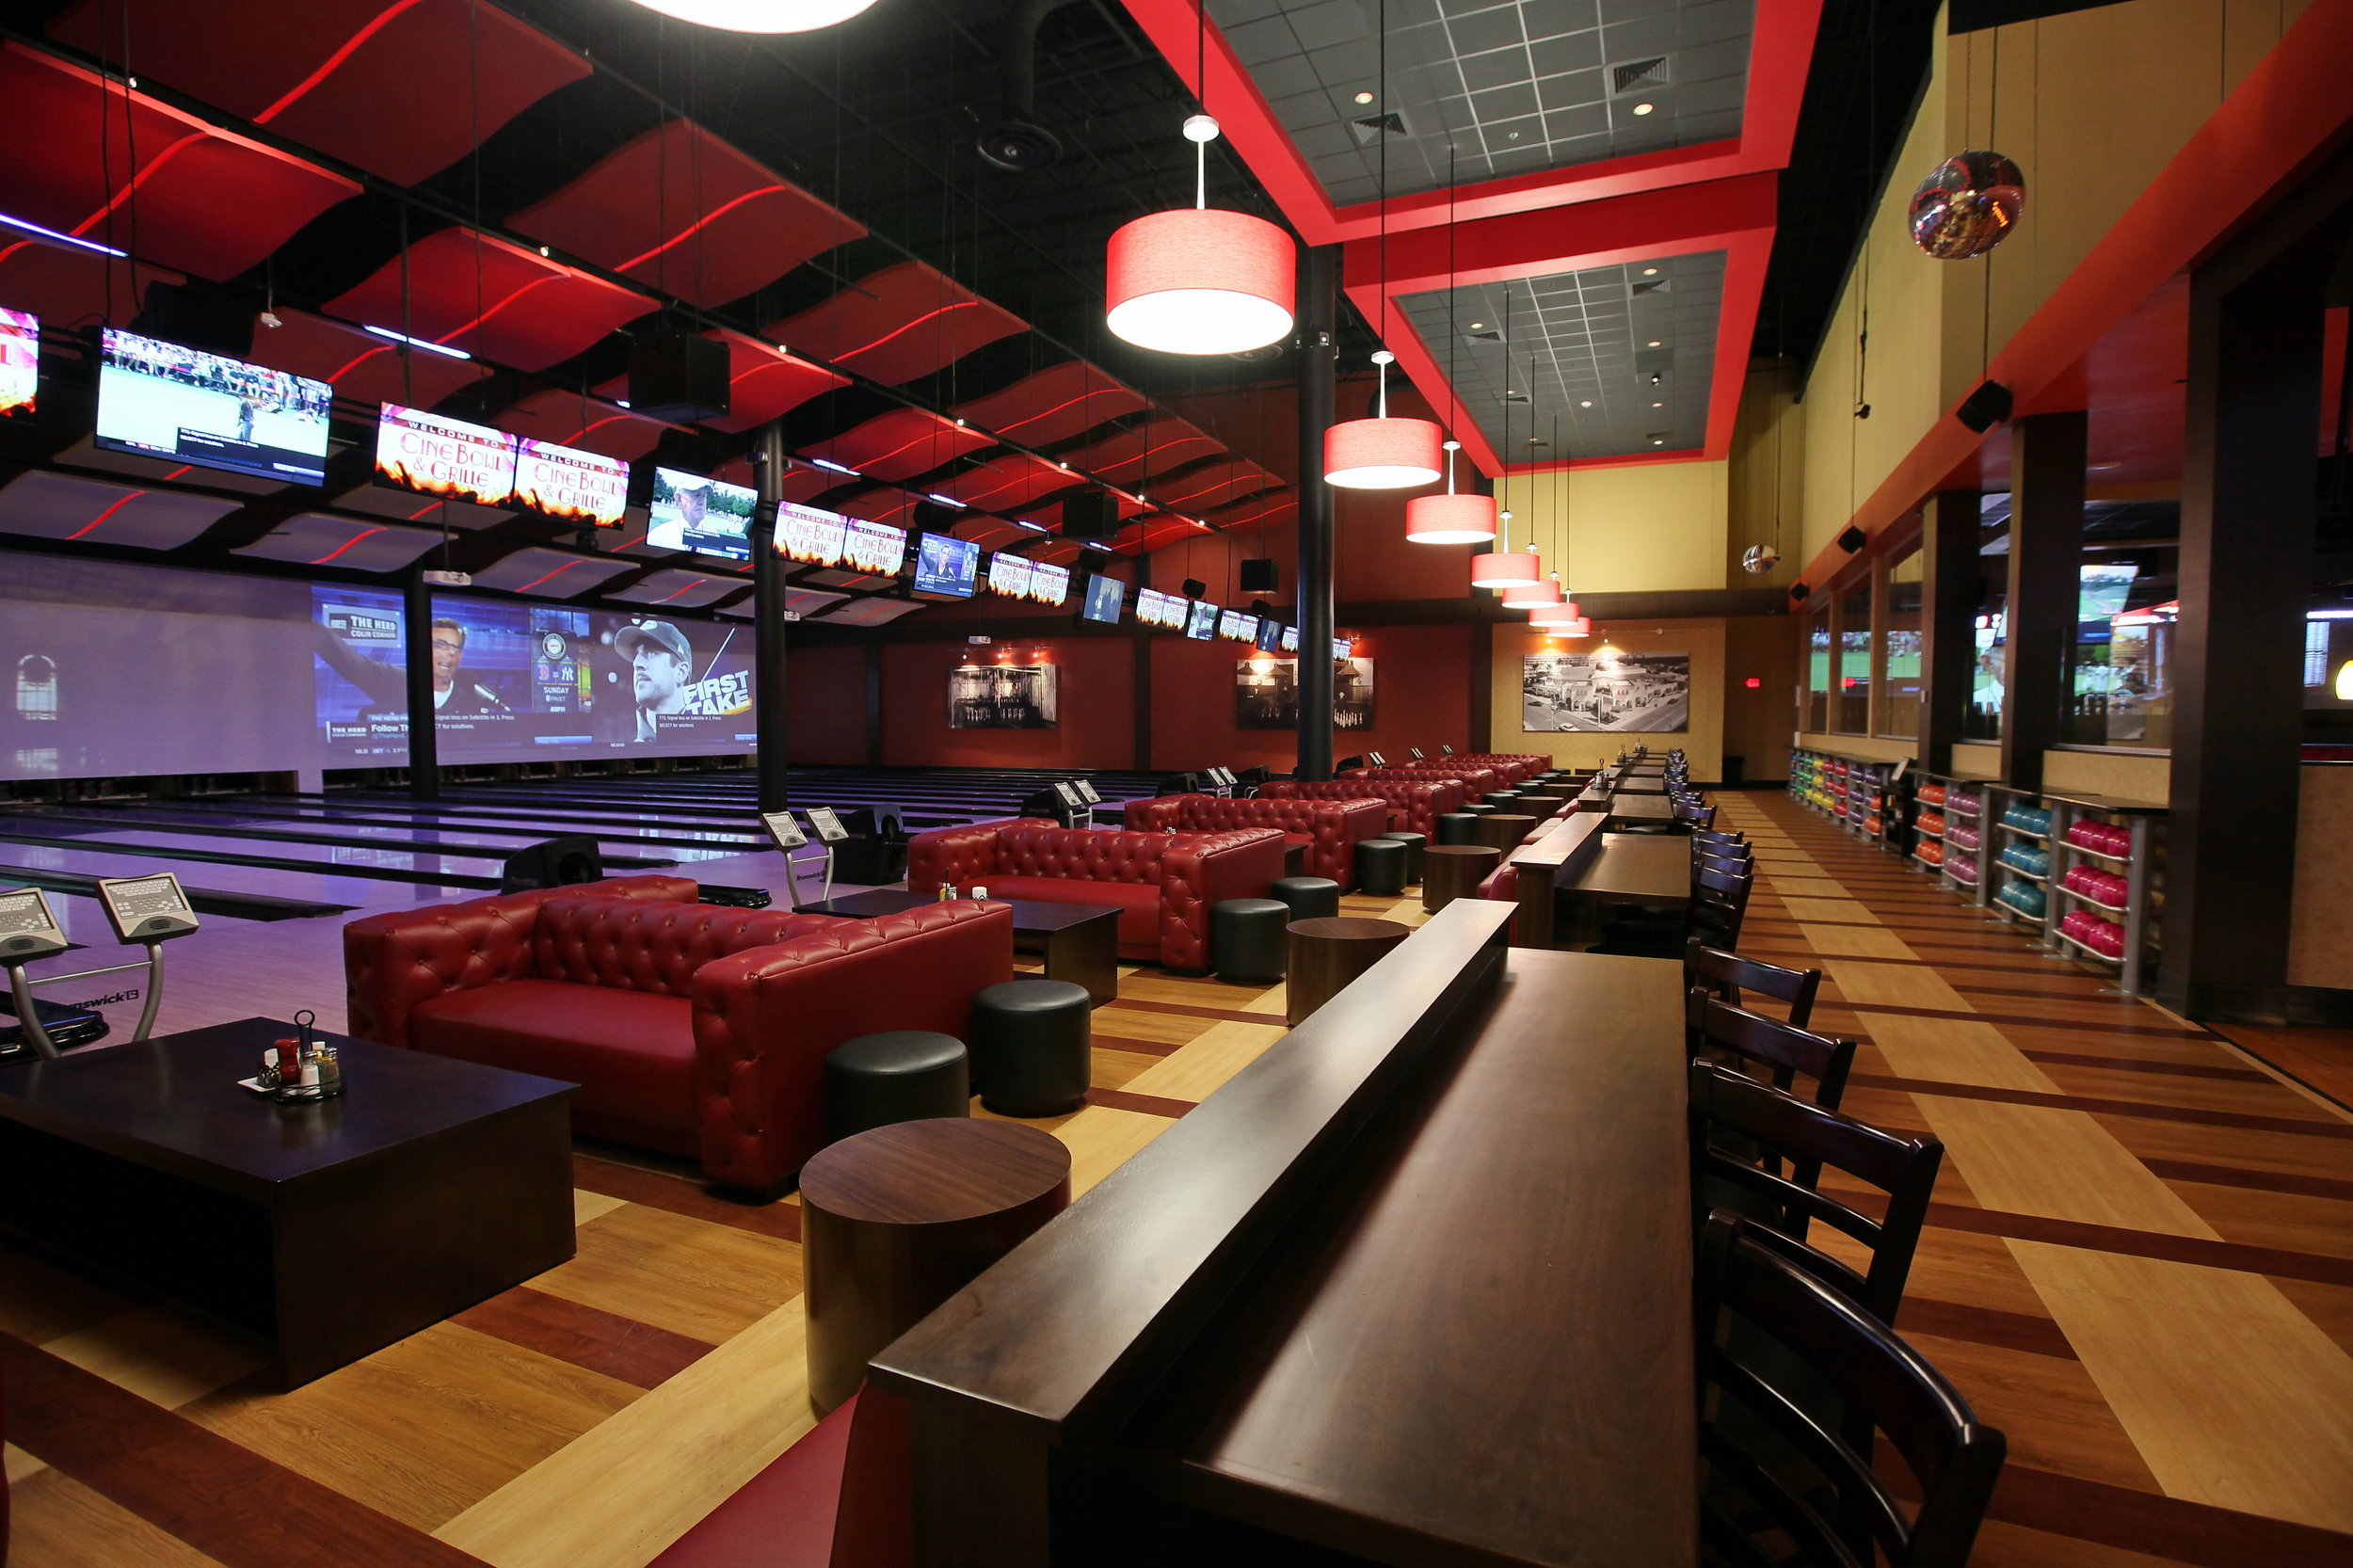 ADW-Entertainment-CineBowl-Grille-Blacksburg-VA-3.jpg